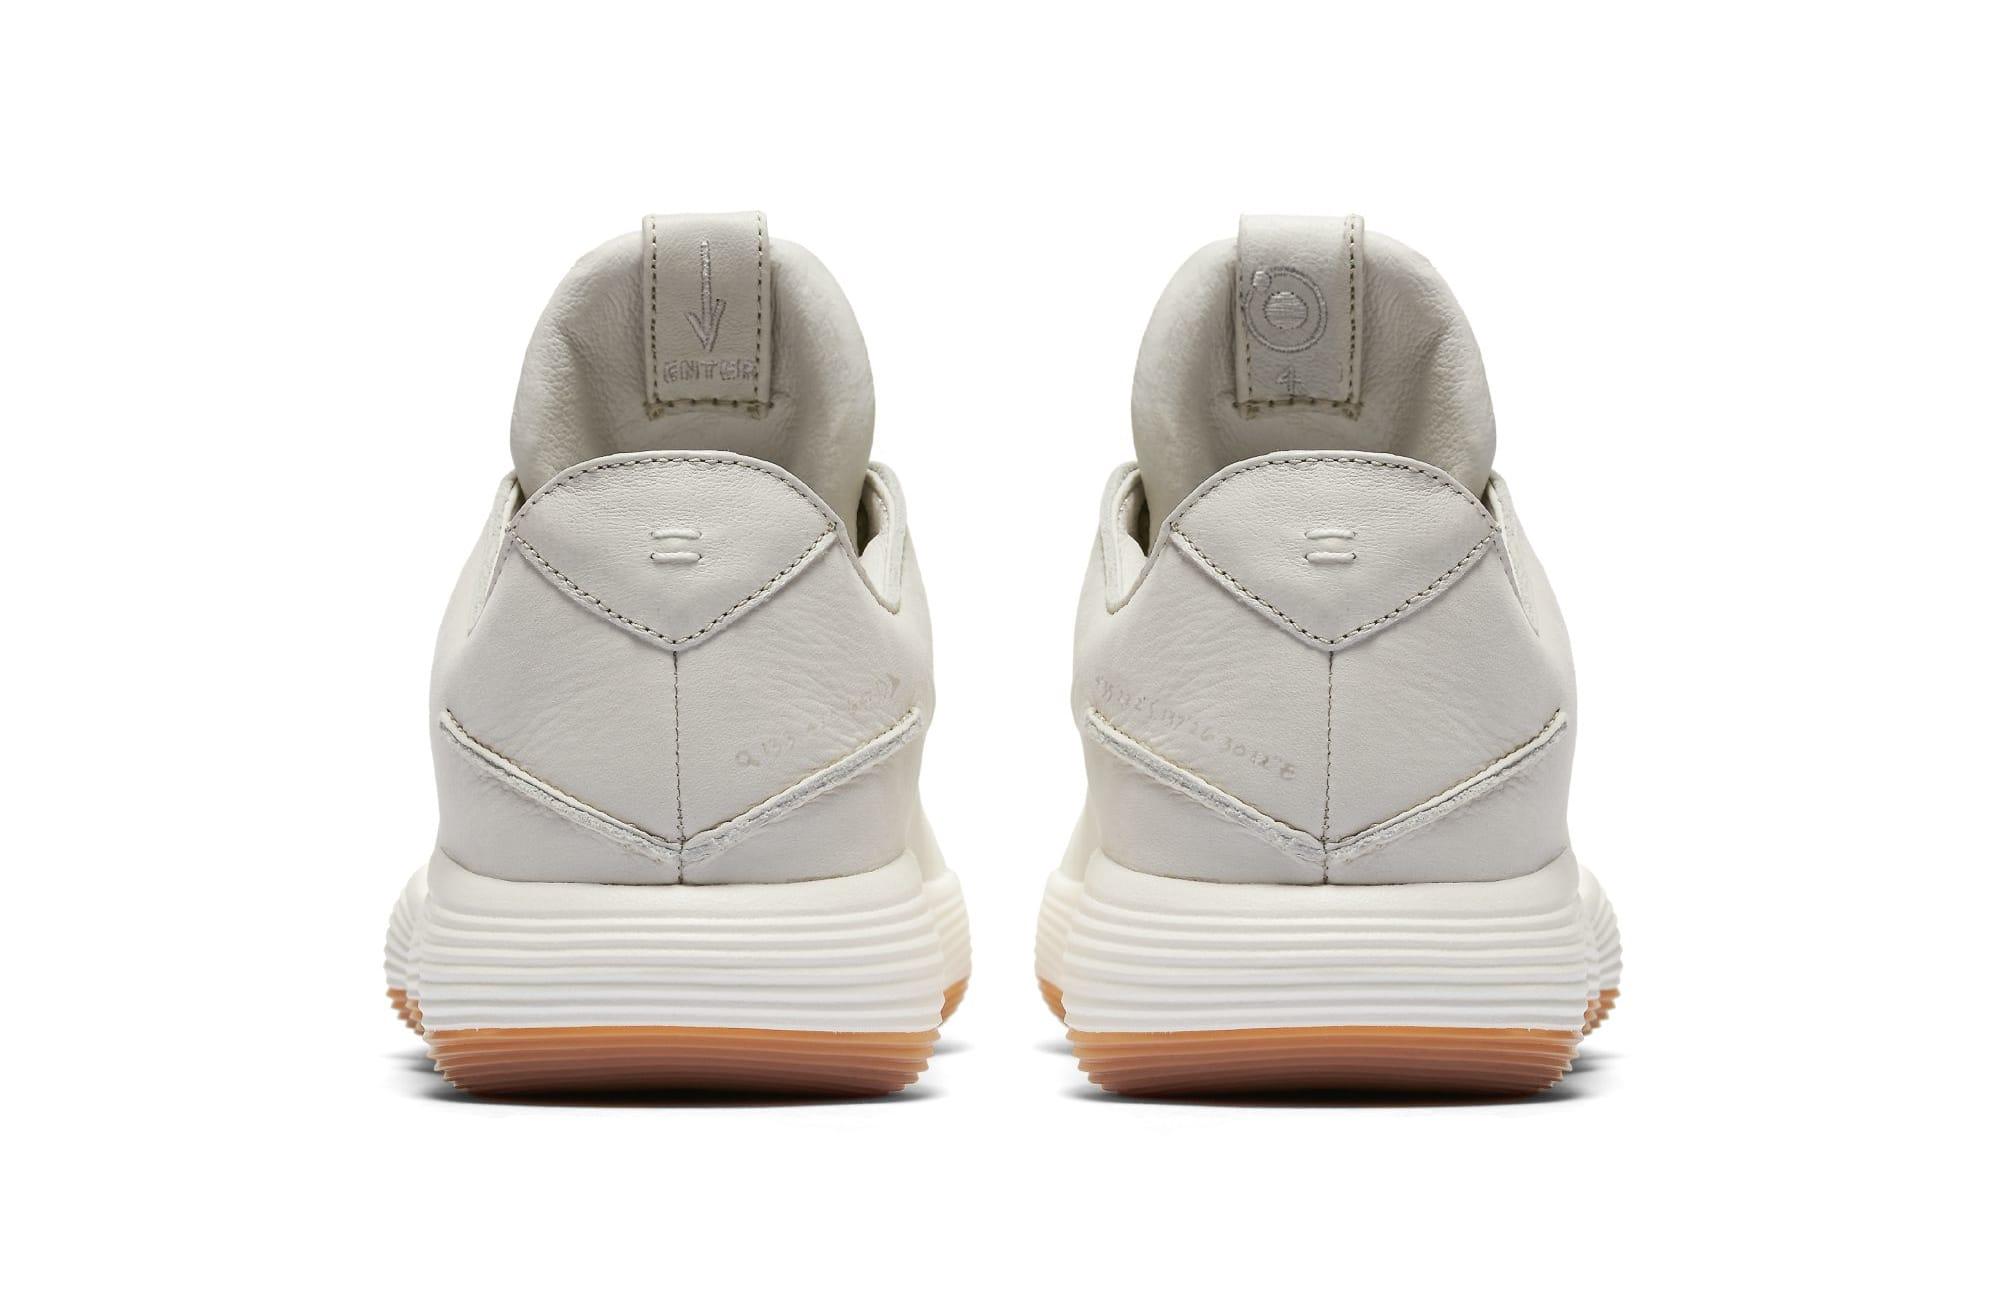 Nike Hyperdunk 2017 Low Lifestyle White (Heel)